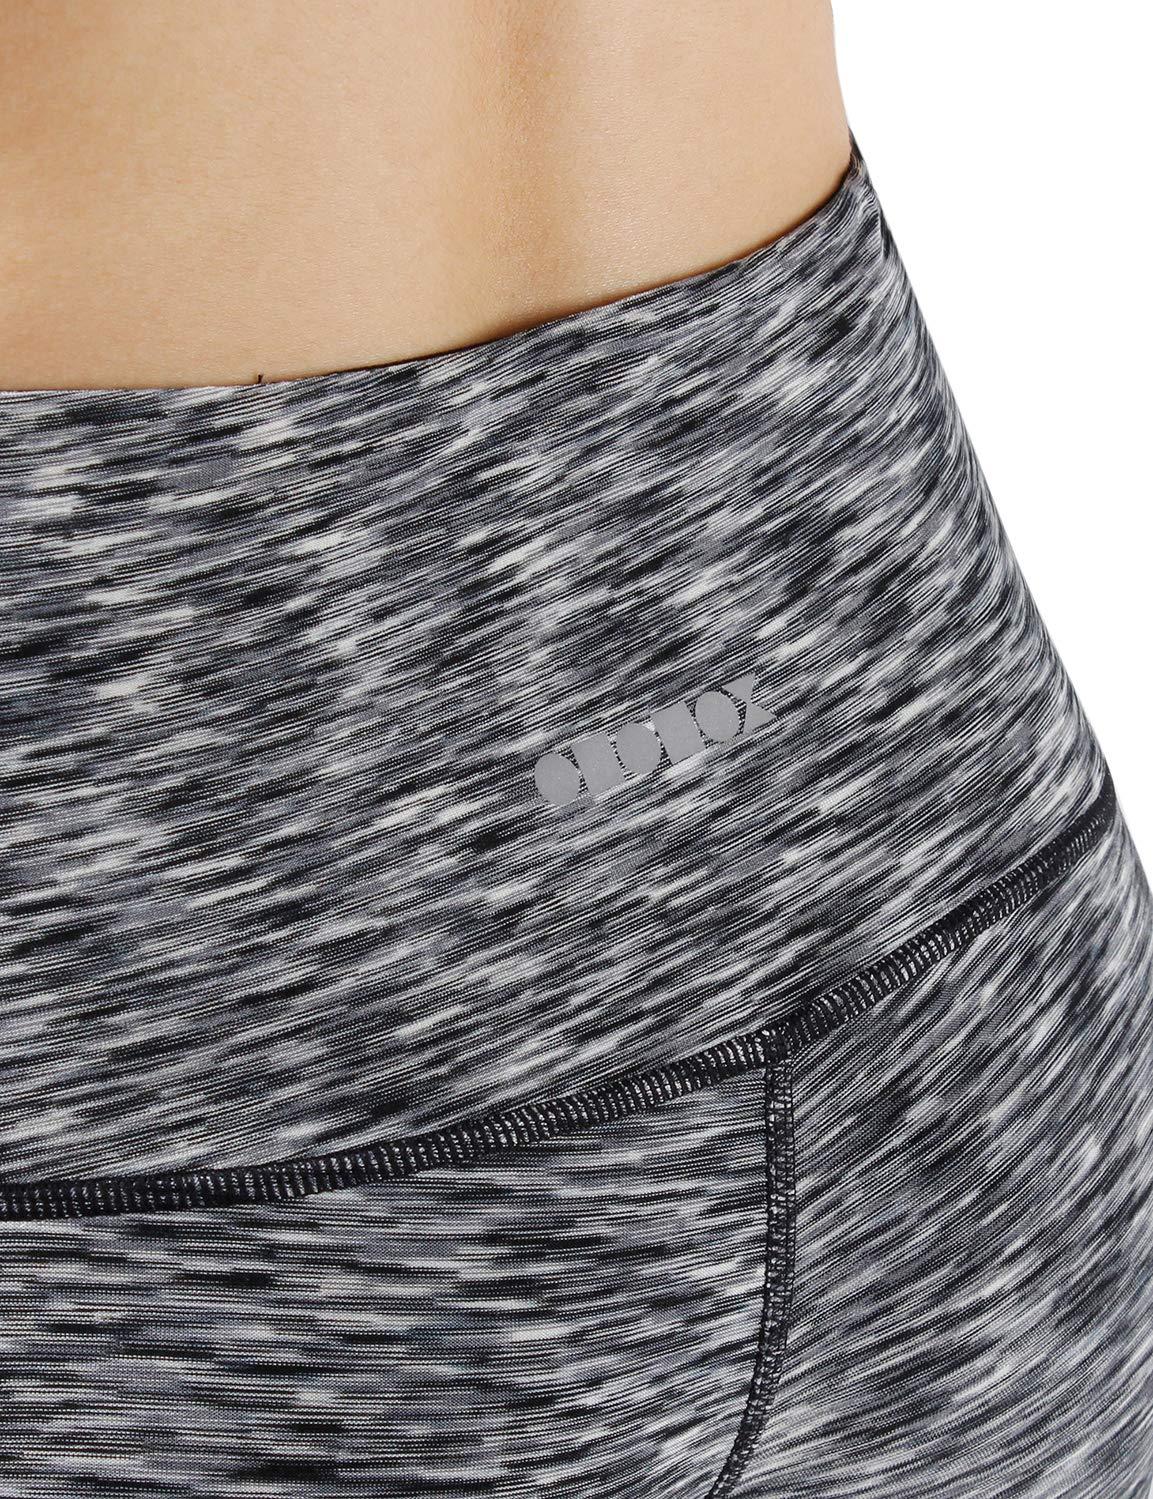 ODODOS High Waist Out Pocket Yoga Capris Pants Tummy Control Workout Running 4 Way Stretch Yoga Leggings,SpaceDyeBlack,X-Small by ODODOS (Image #5)